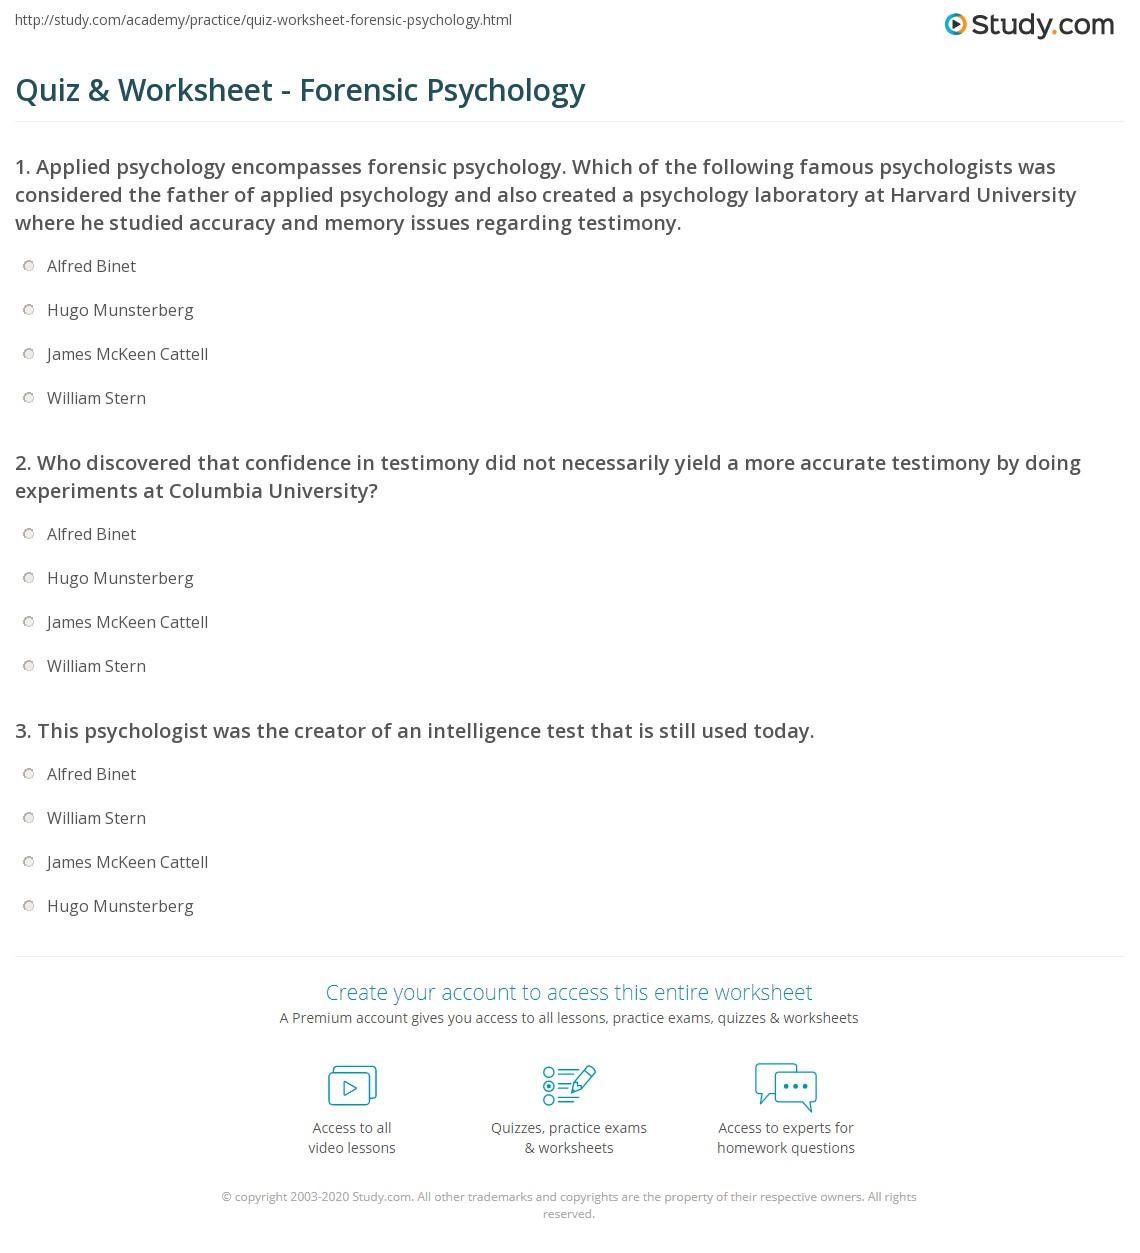 Forensic Psychology Definition